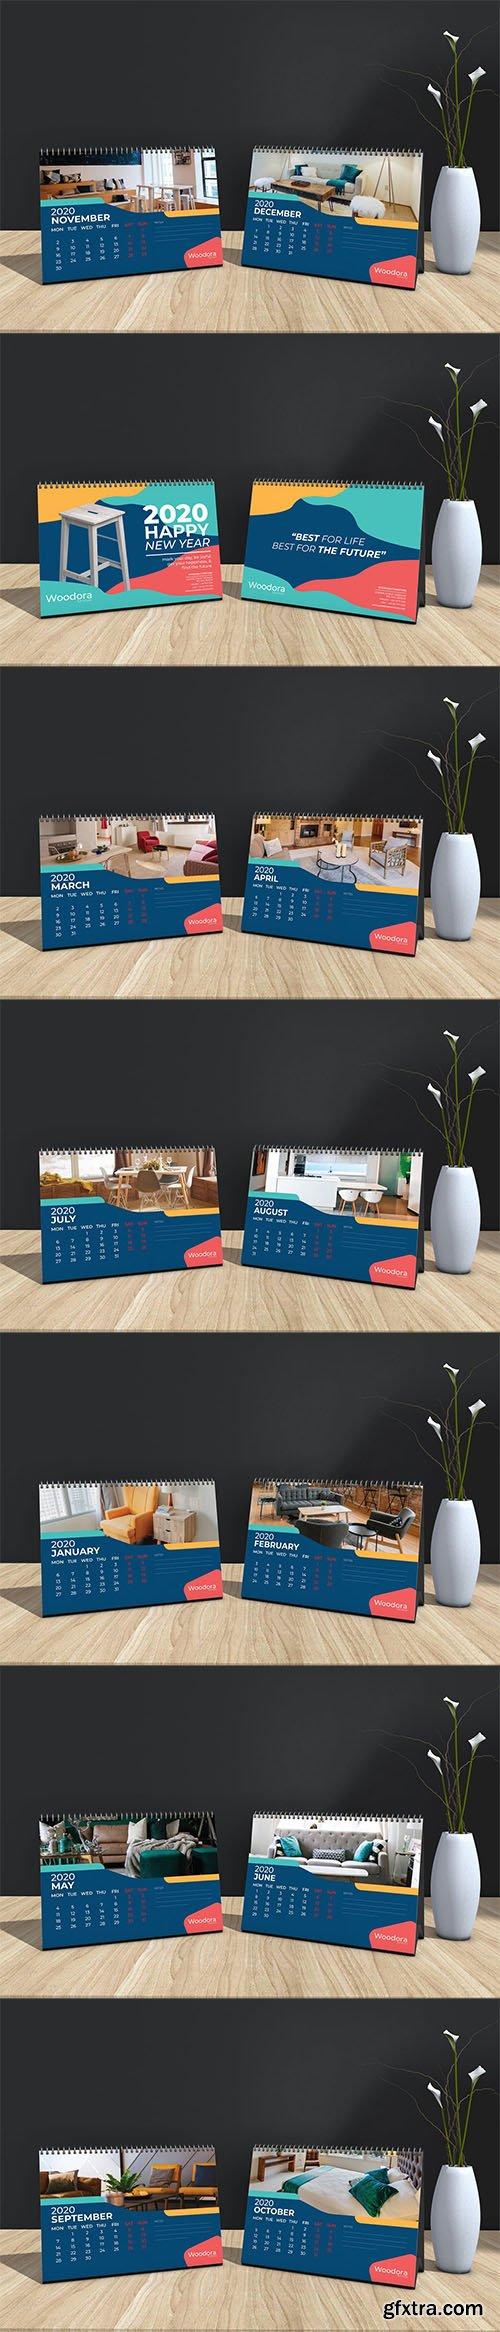 Woodora Furniture Table Calendar 2020